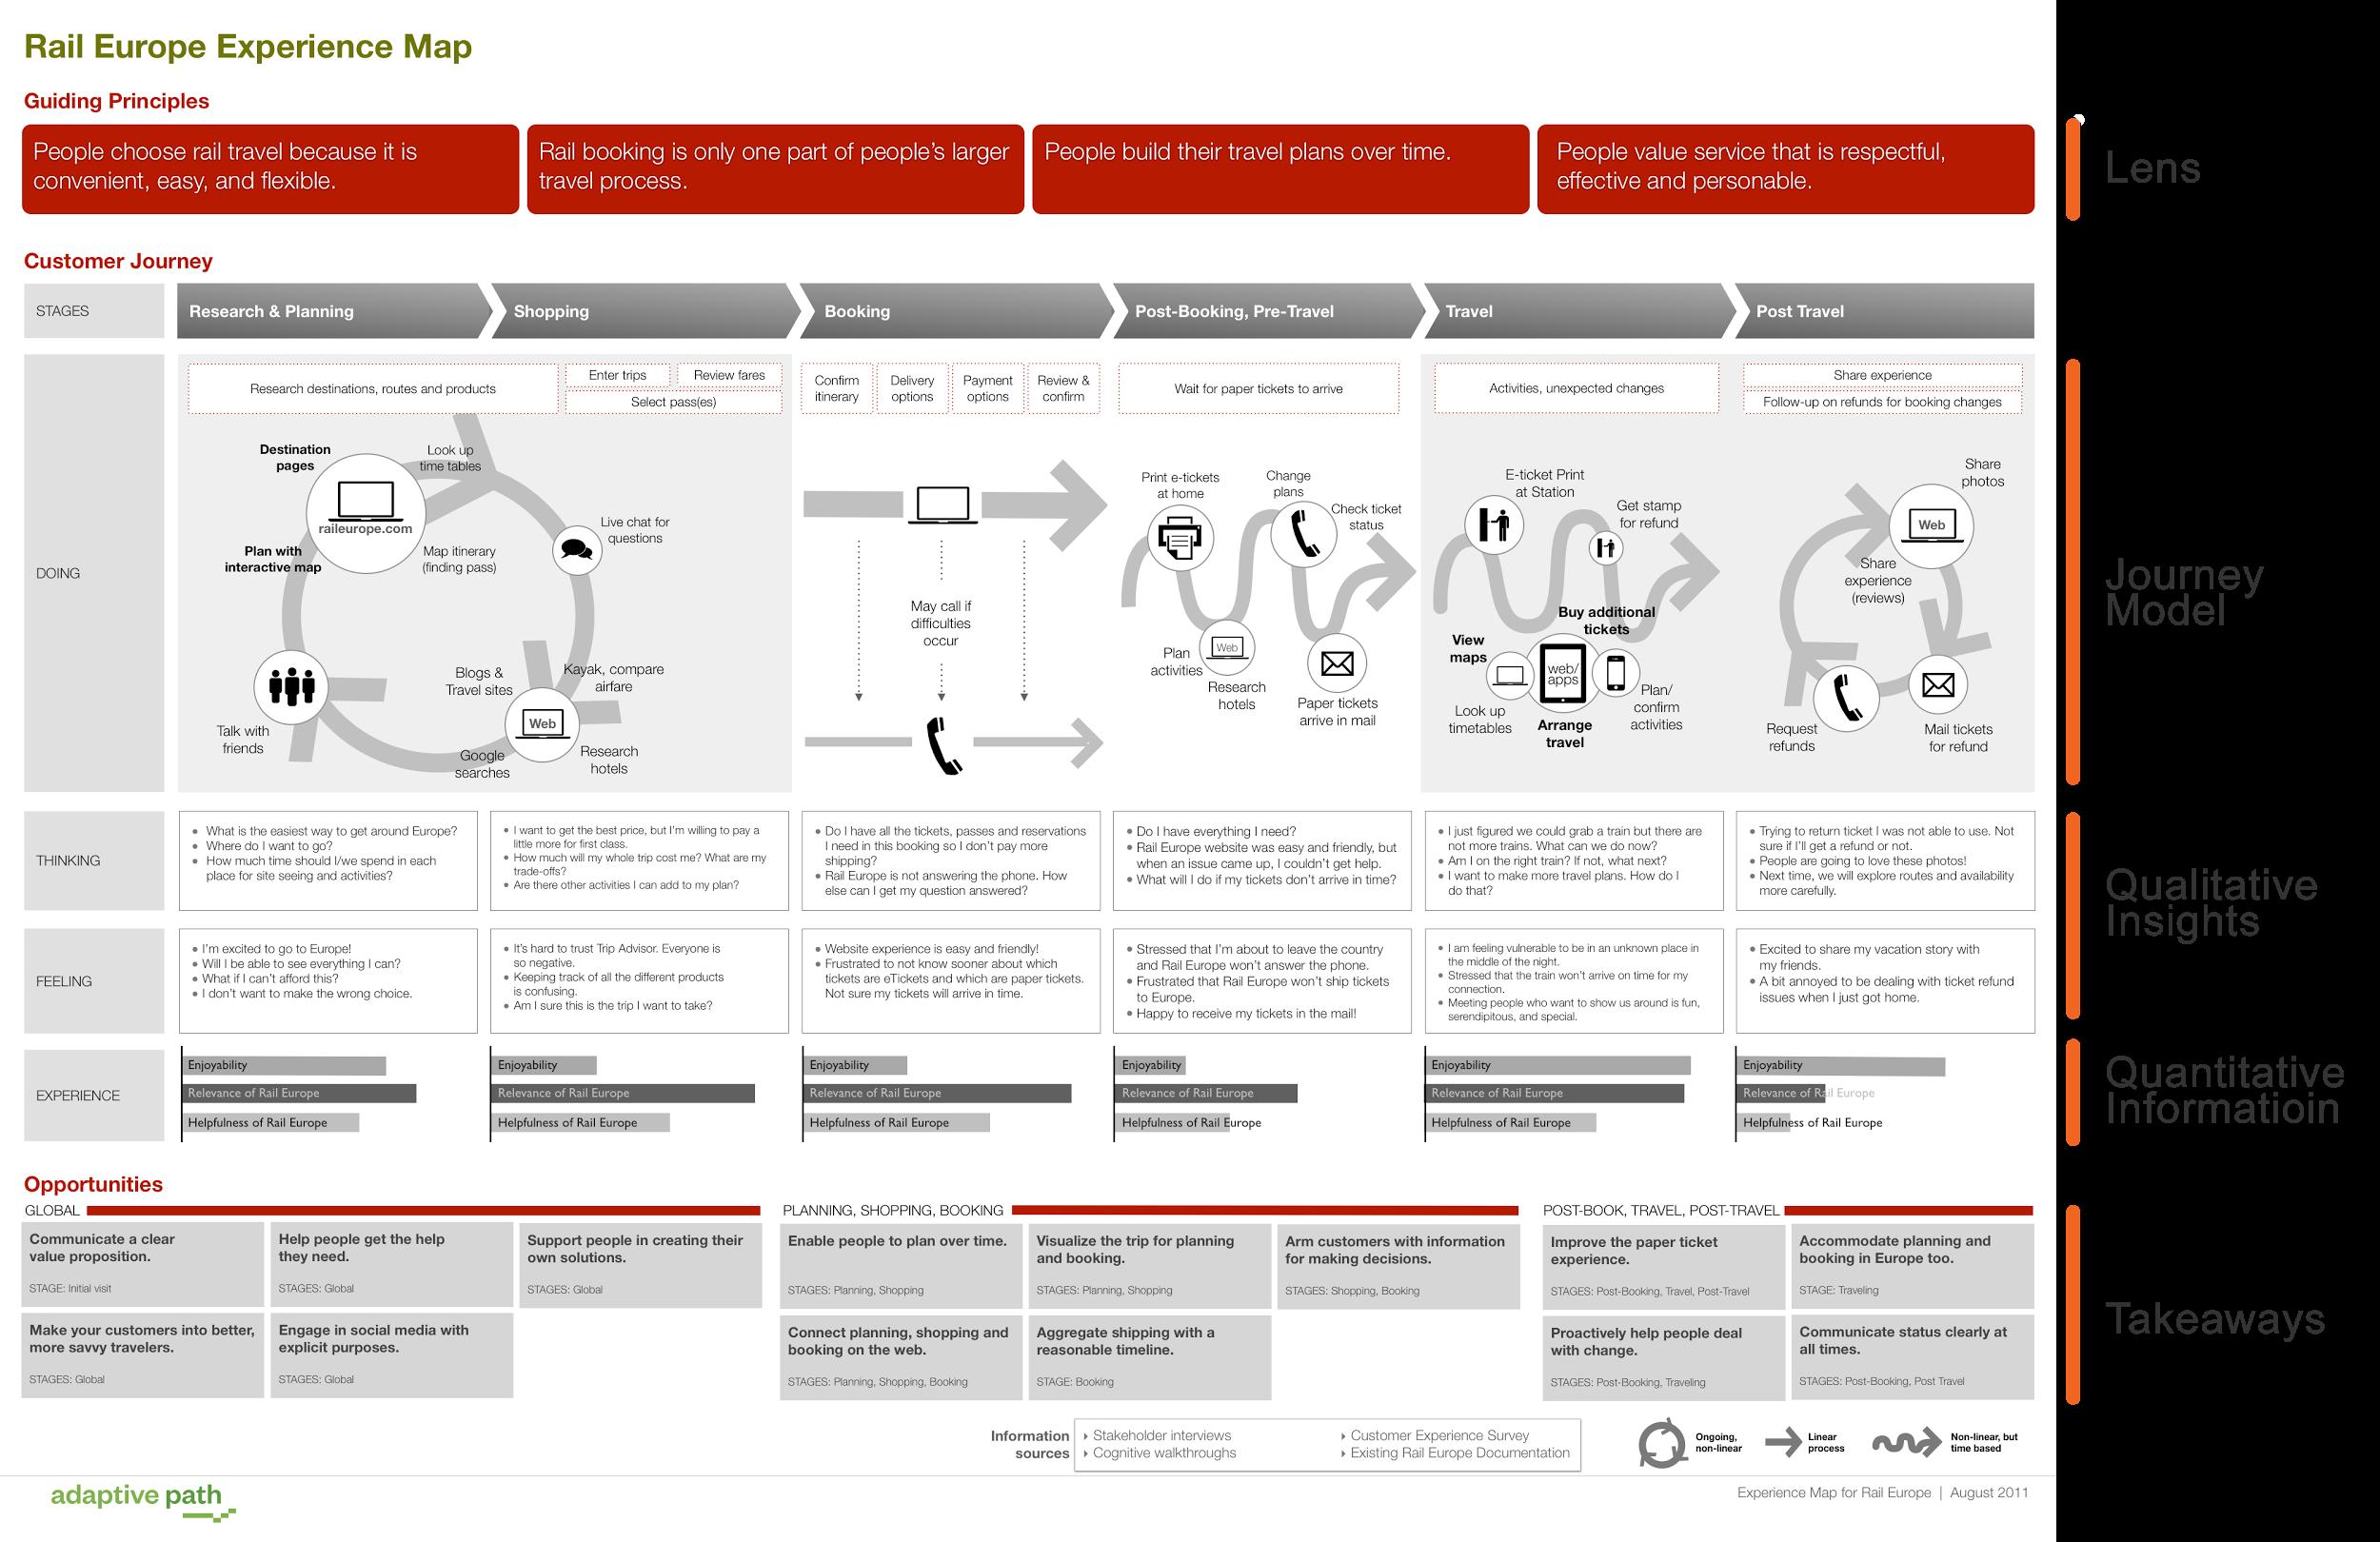 rail europe customer journey map Rail Europe customer journey map | Journey mapping, Customer